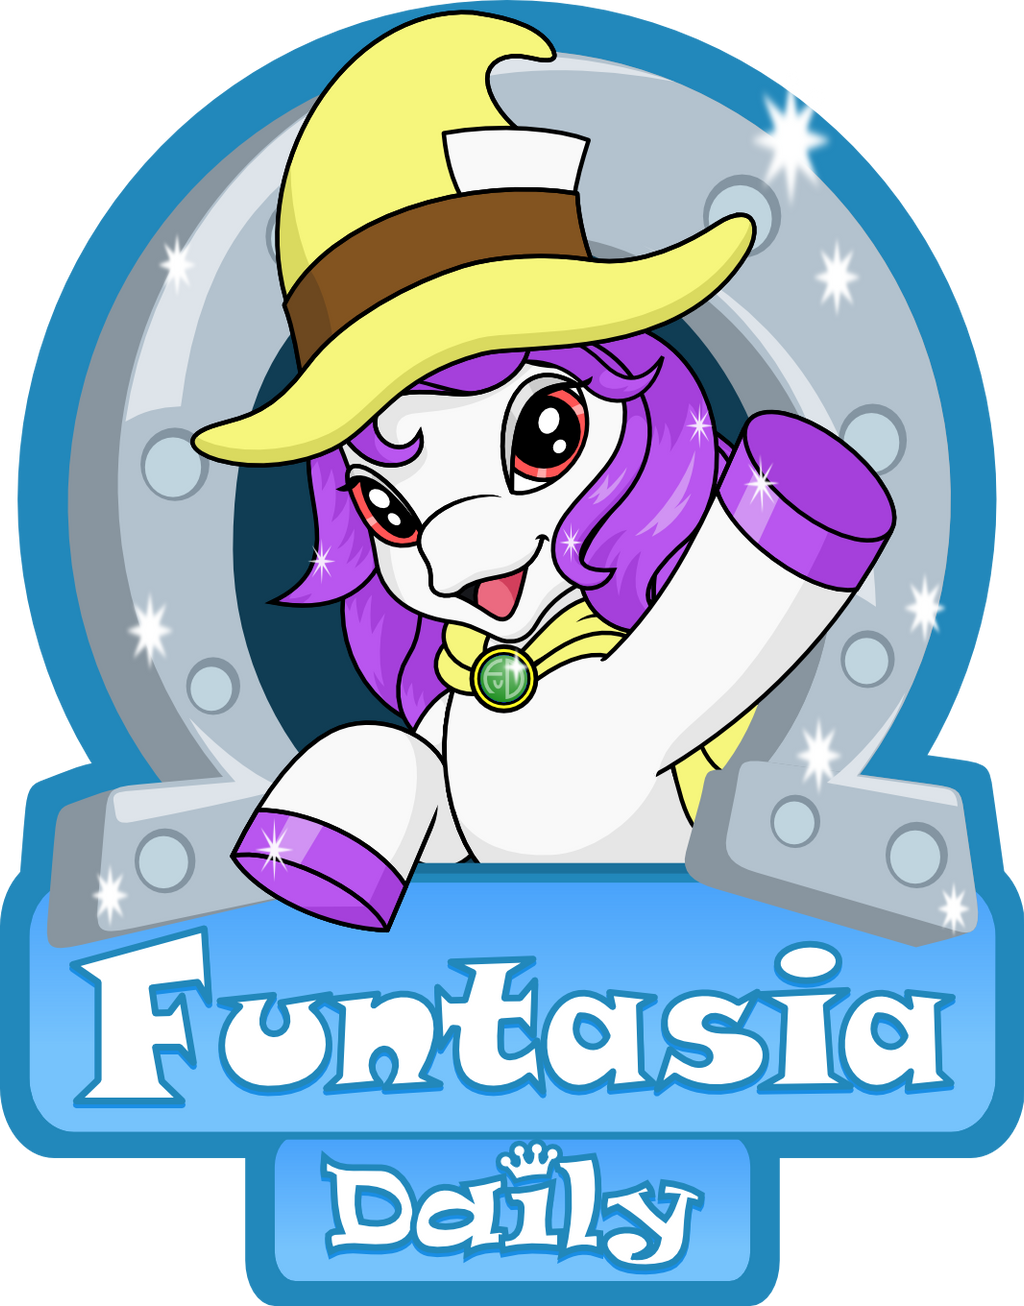 Funtasia Daily logo